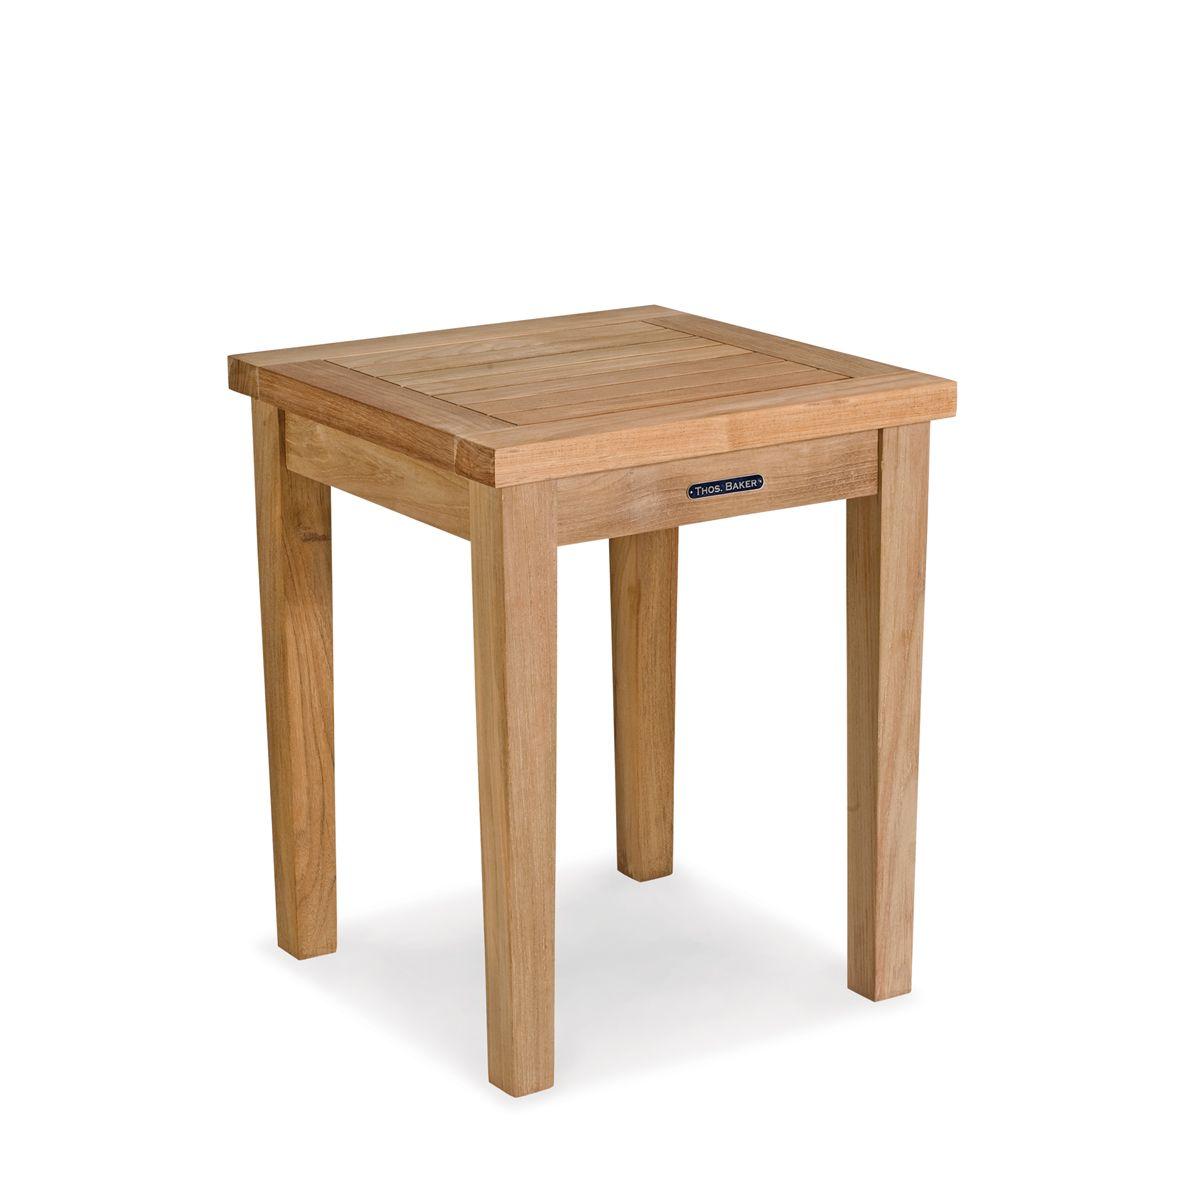 Teak Patio Side Table Veranda Collection By Thos Baker Veranda